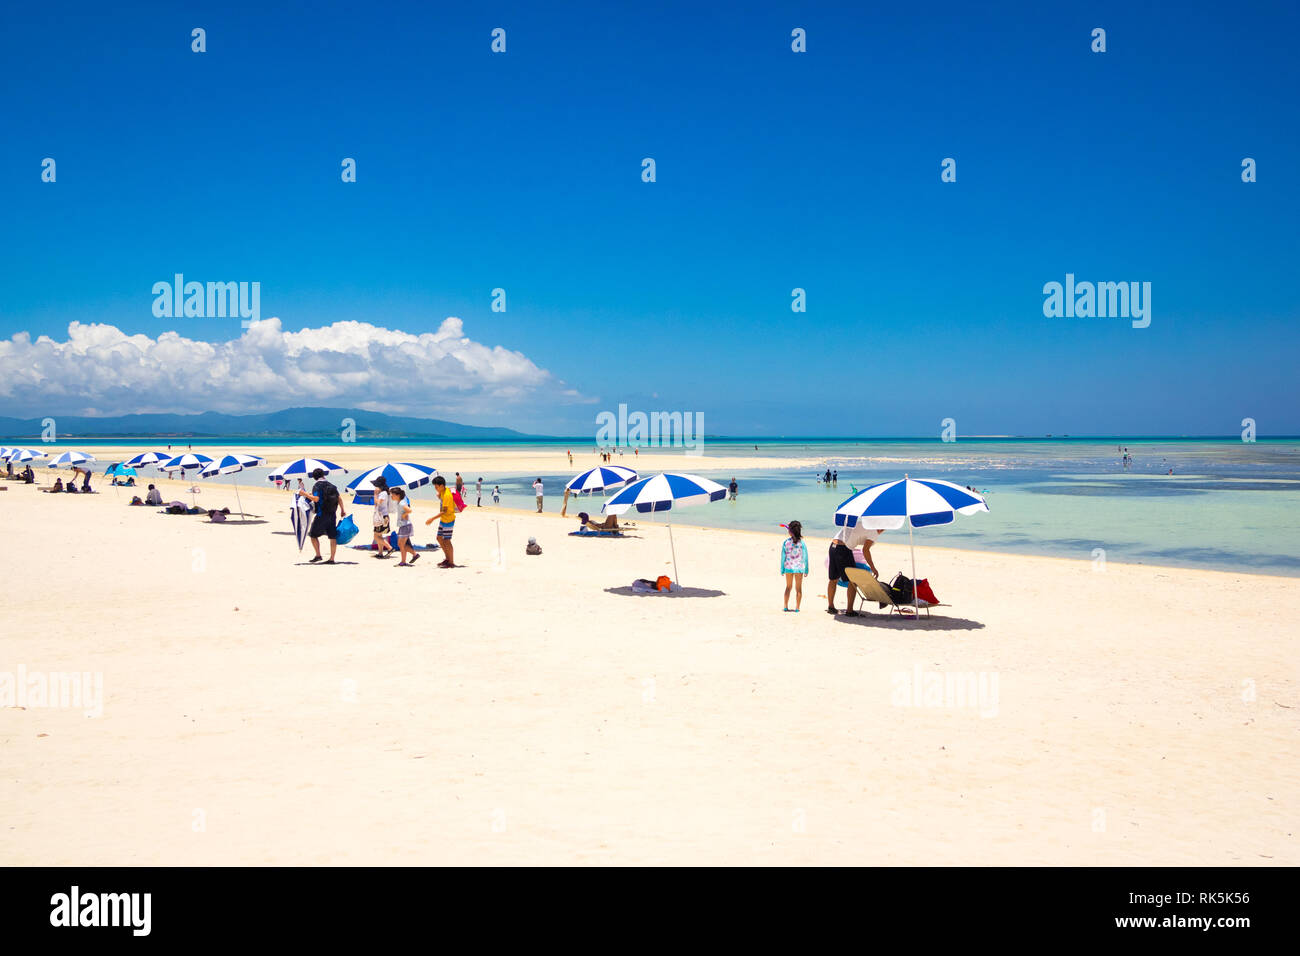 Tourists and blue and white beach umbrellas on Kondoi Beach, Taketomi Island (Taketomi-jima), Yaeyama Islands, Okinawa Prefecture, Japan. - Stock Image